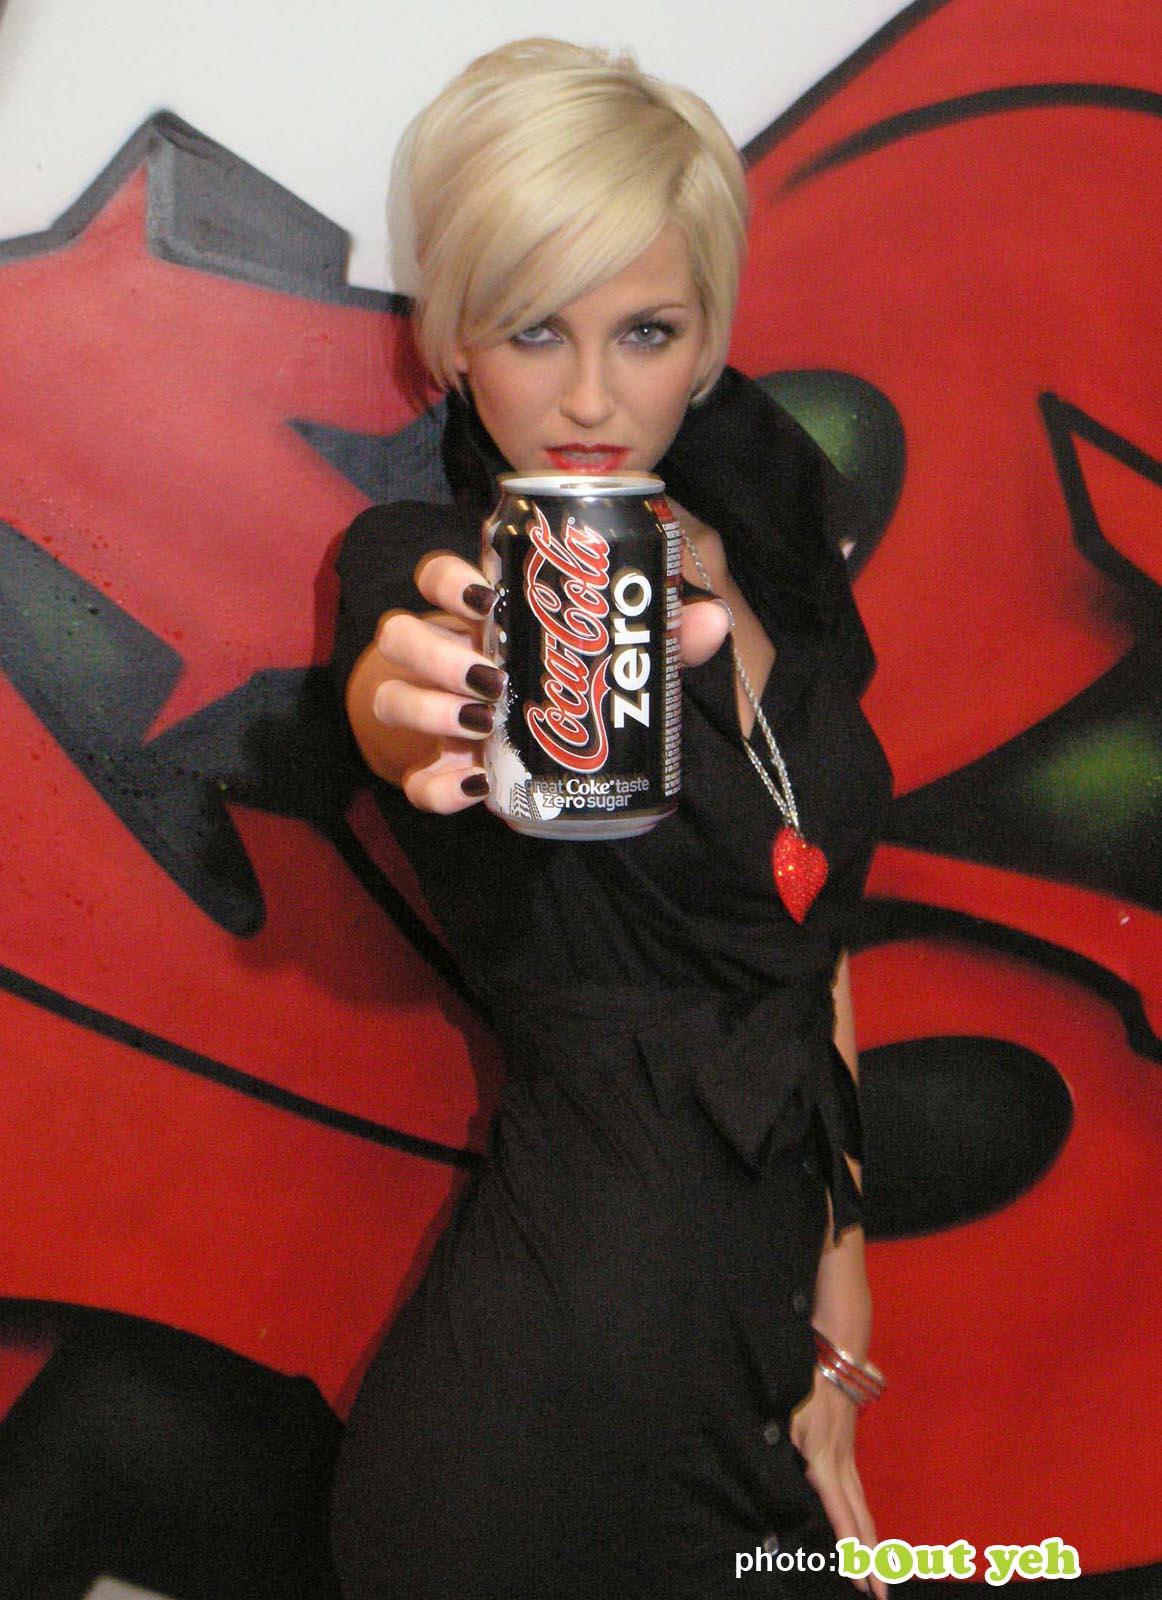 PR photographers Belfast portfolio photo 1014105 Sarah Harding promoting Coke Zero for Edelman in Belfast - Bout Yeh photography Belfast